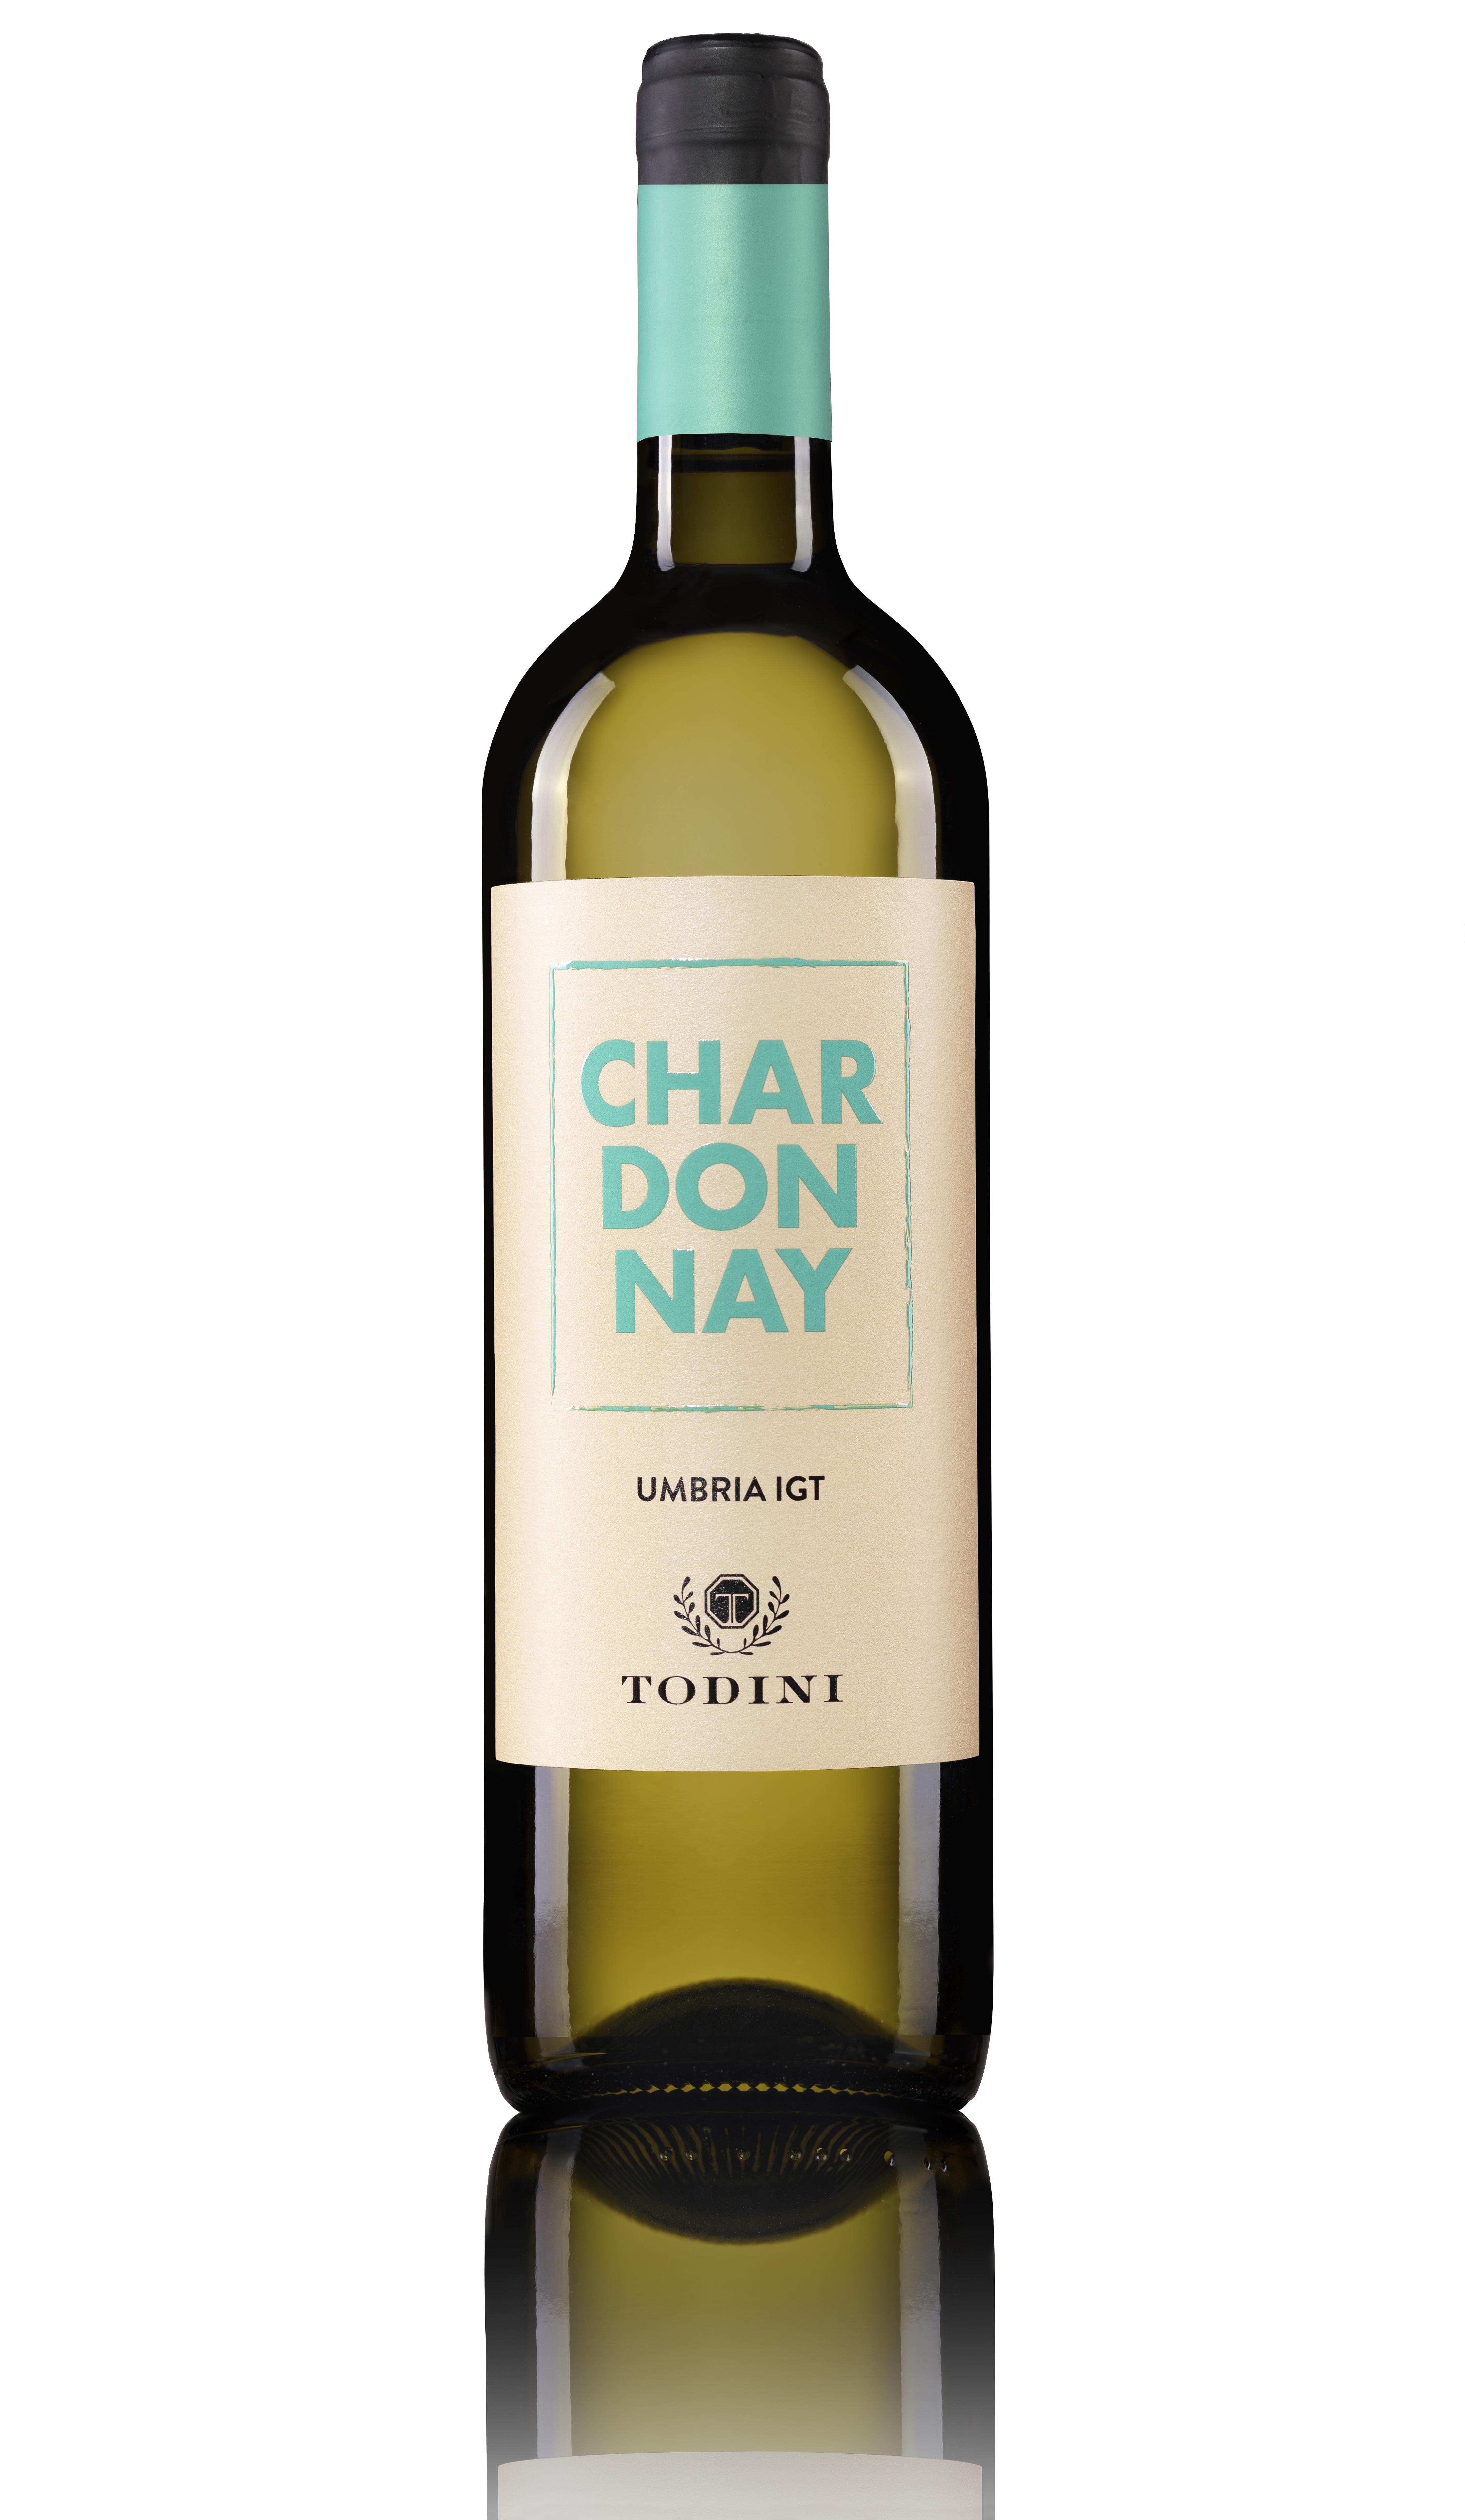 CHARDONNAY - Umbria Bianco I.G.T.